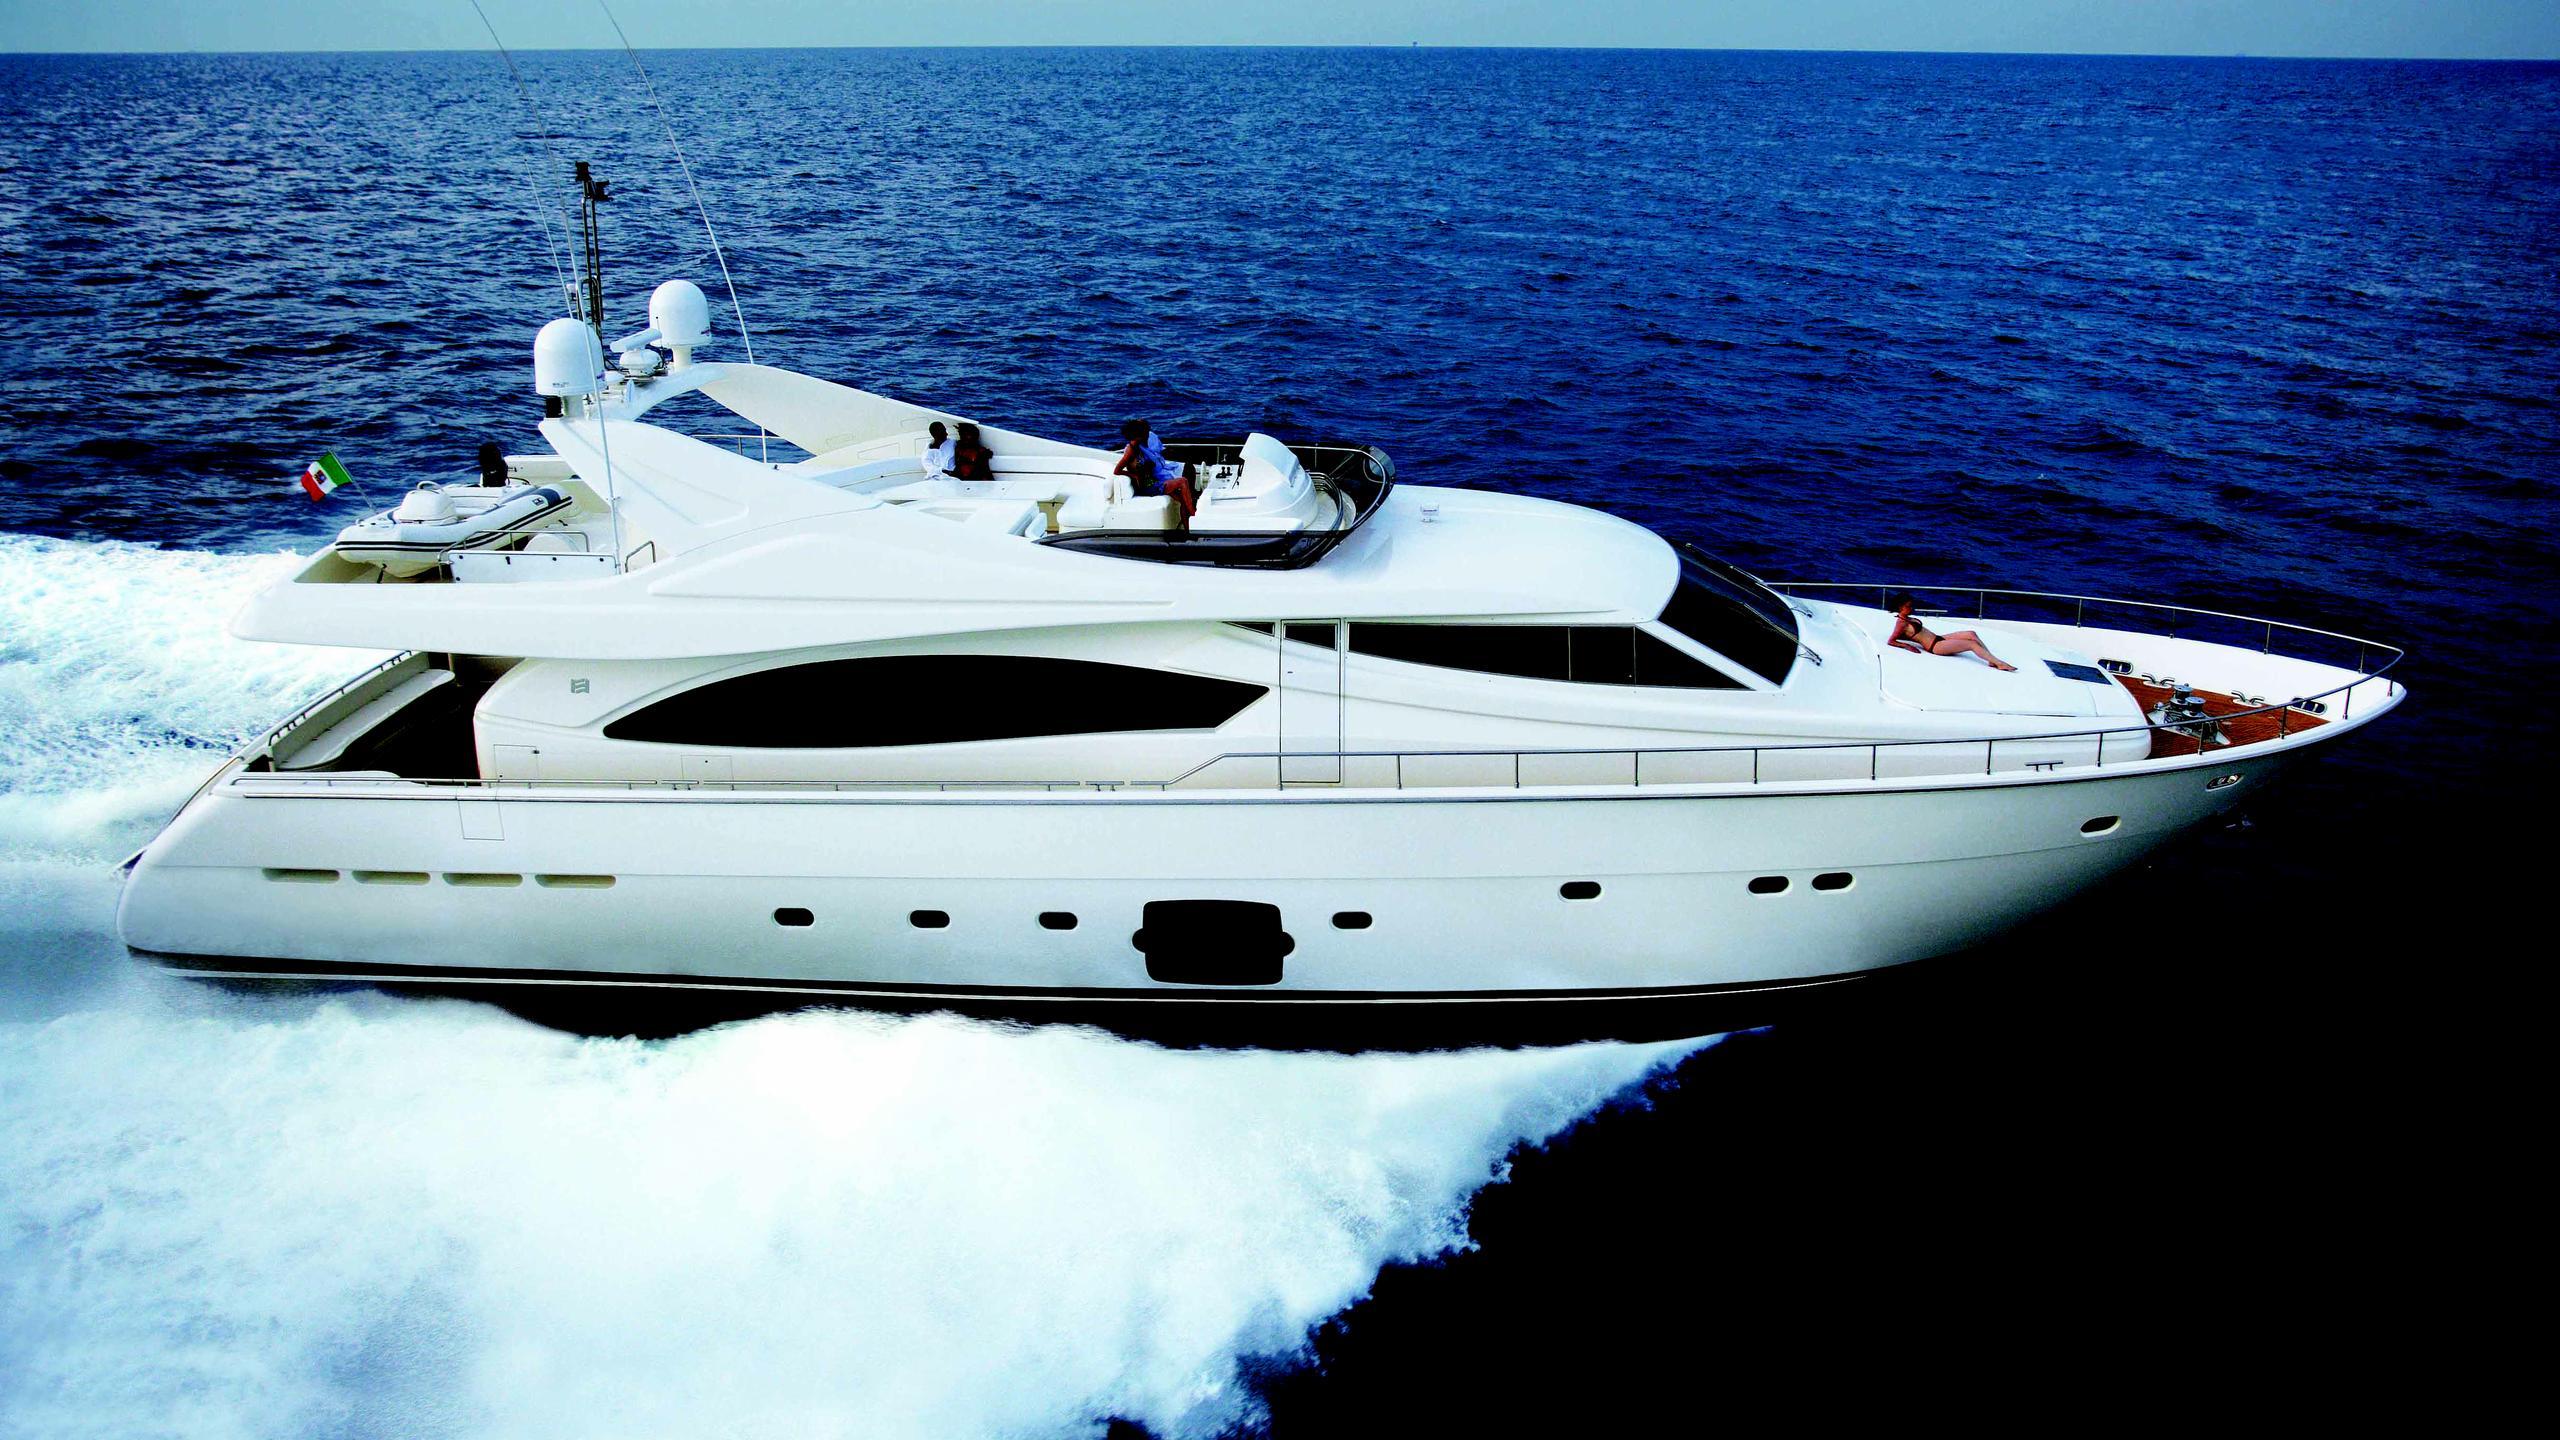 aldila-motor-yacht-ferretti-880-2005-27m-cruising